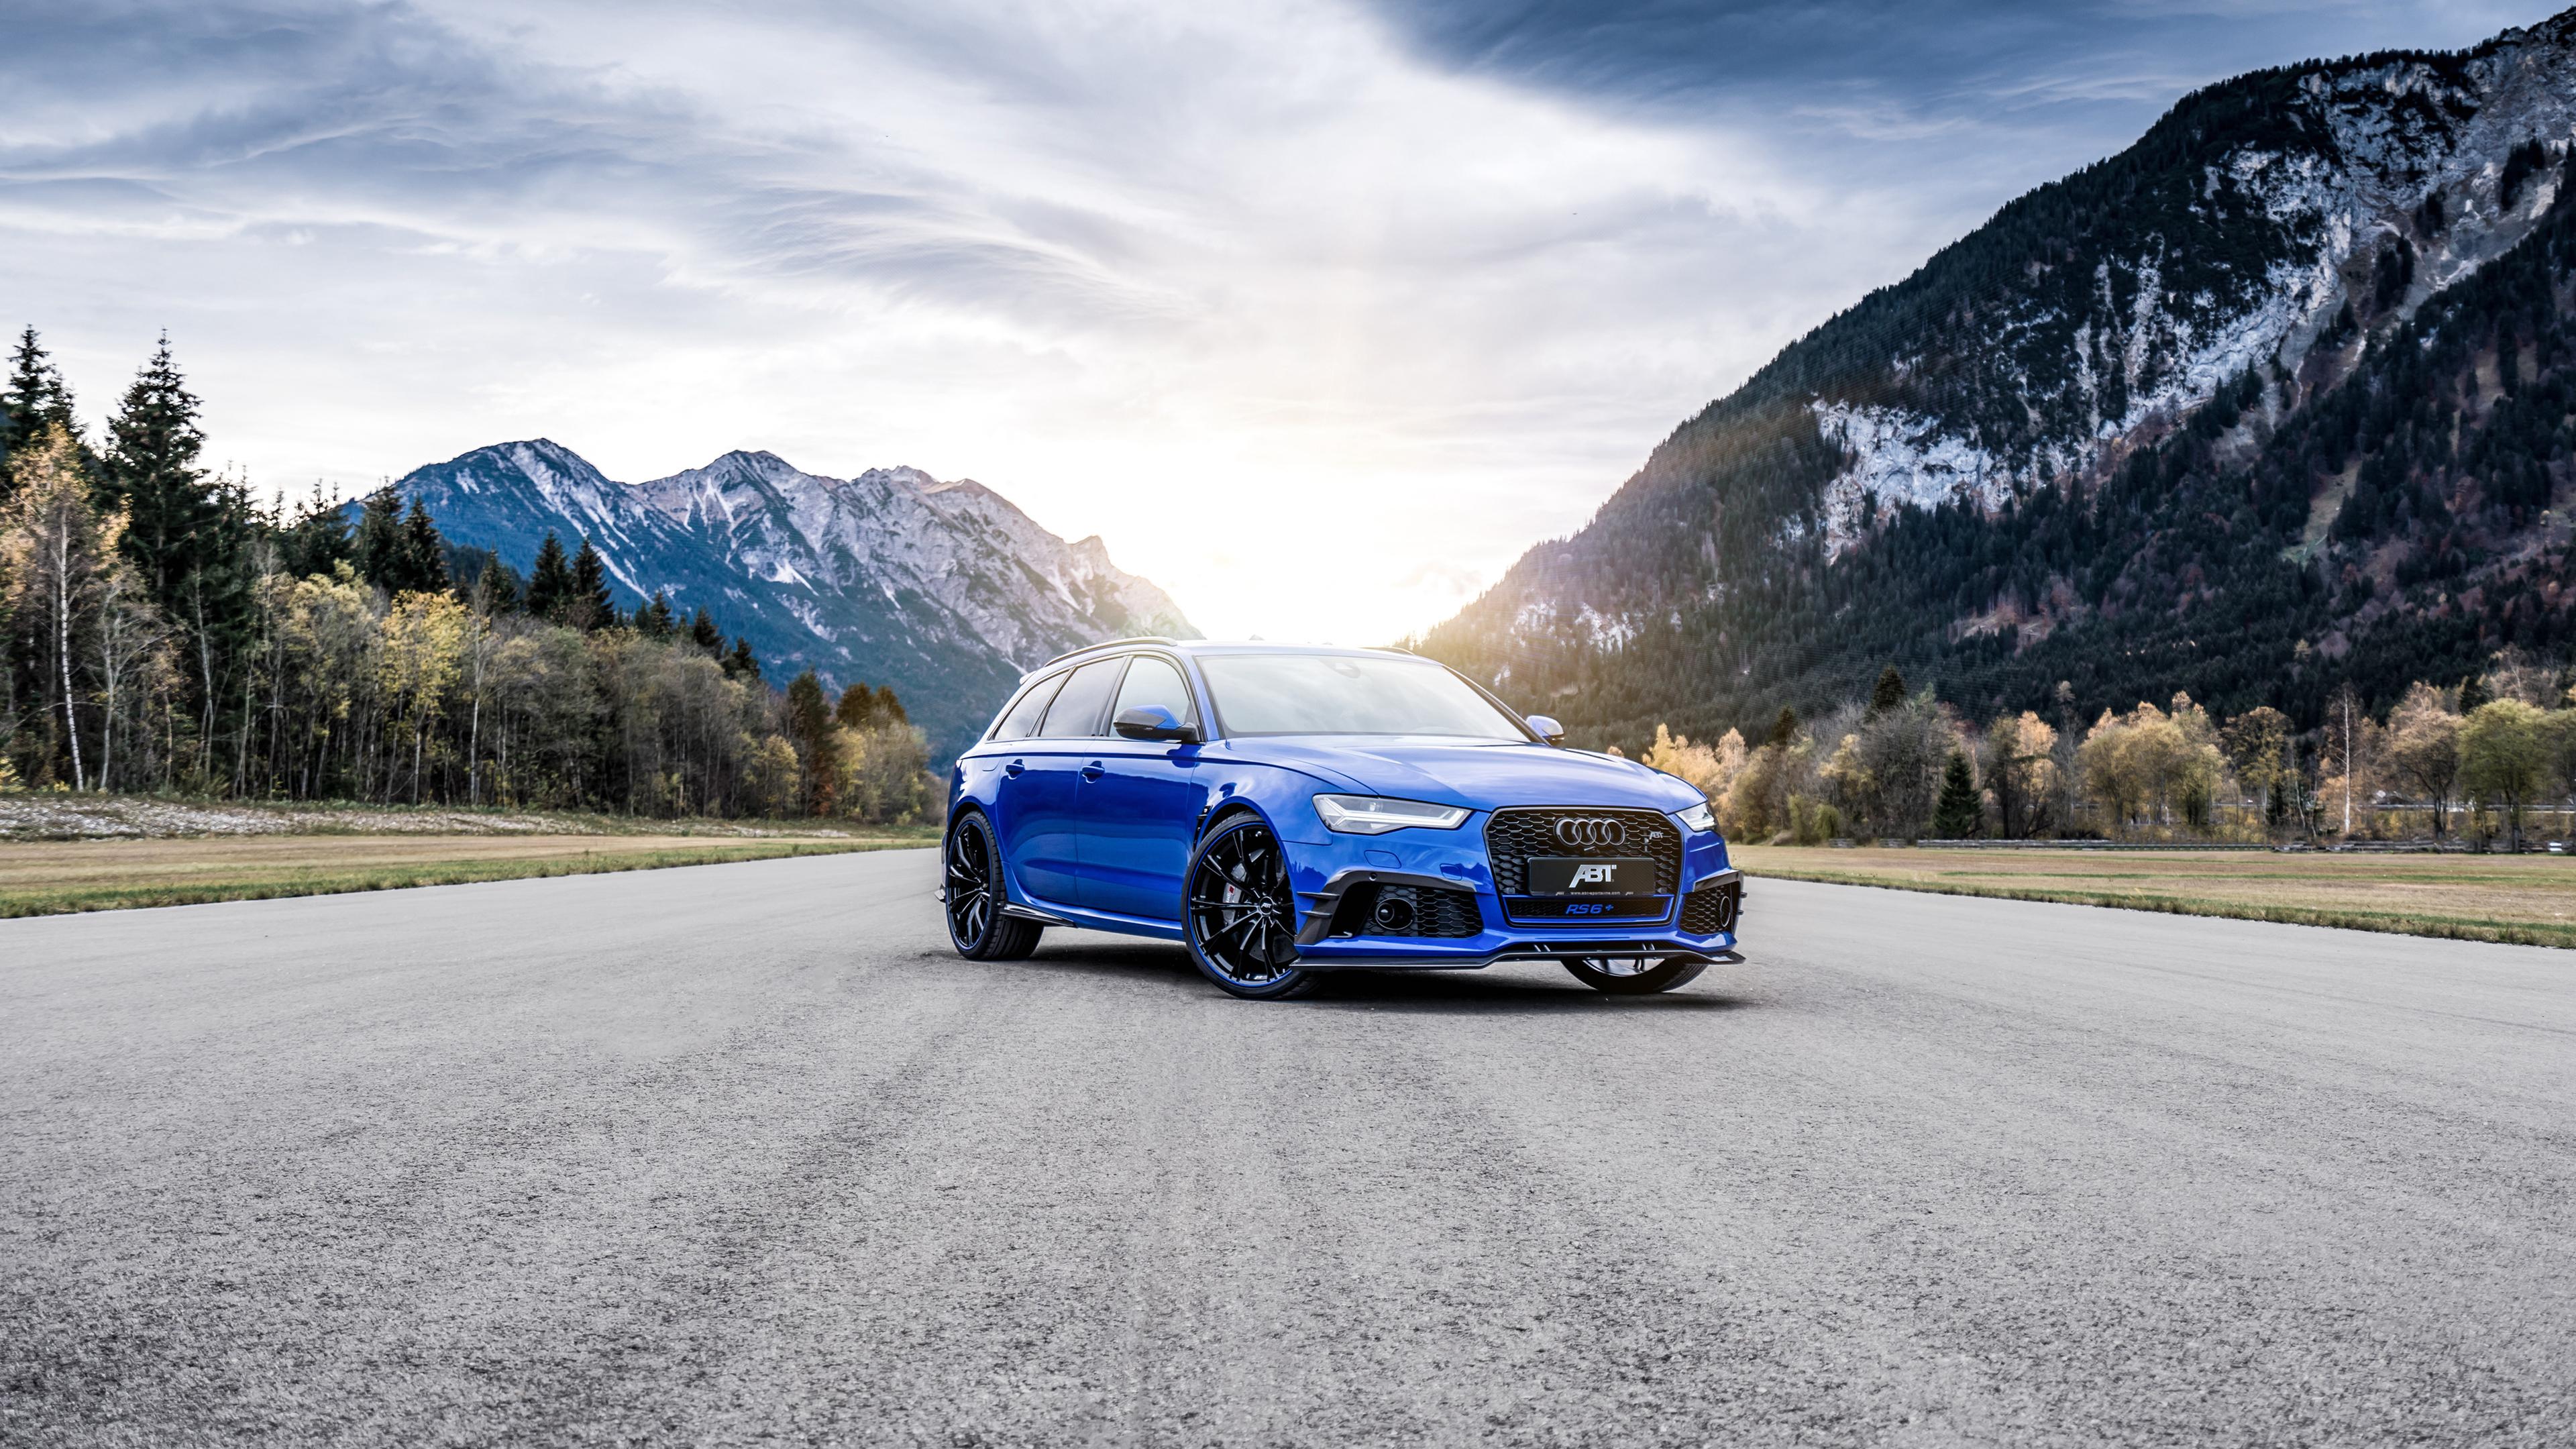 audi abt rs 6 4k 1546361784 - Audi ABT RS 6 4k - hd-wallpapers, cars wallpapers, audi wallpapers, 4k-wallpapers, 2018 cars wallpapers